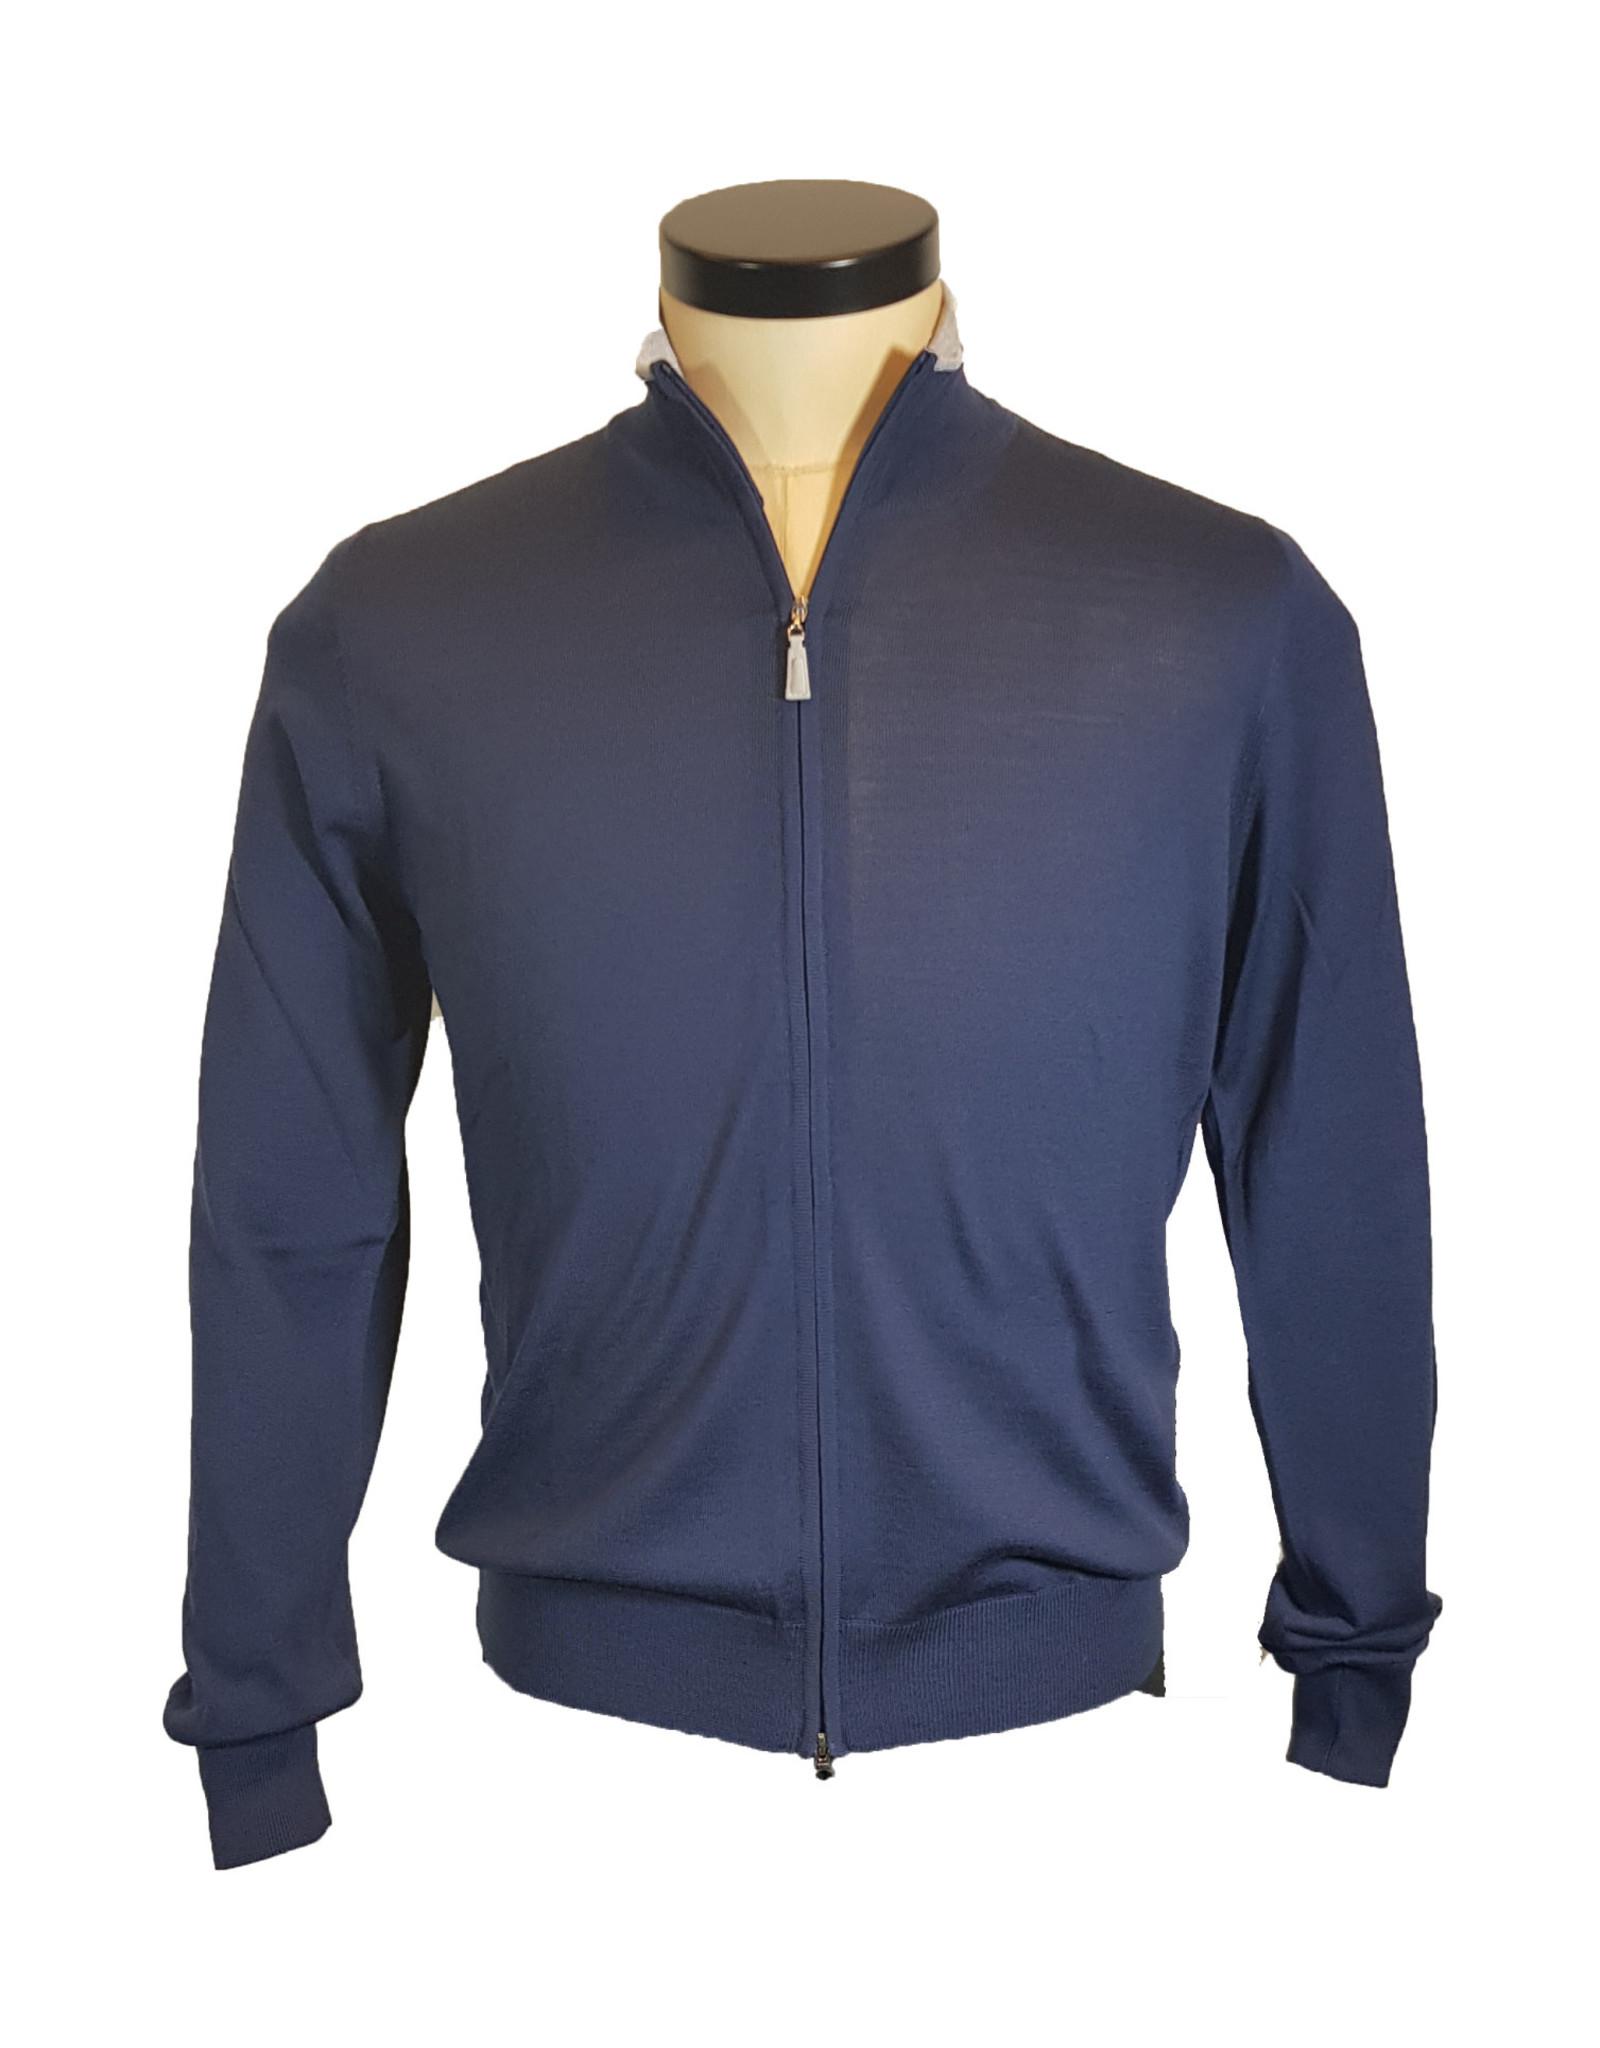 Gran Sasso Sandmore's cardigan blauw 14794/583 M:45144